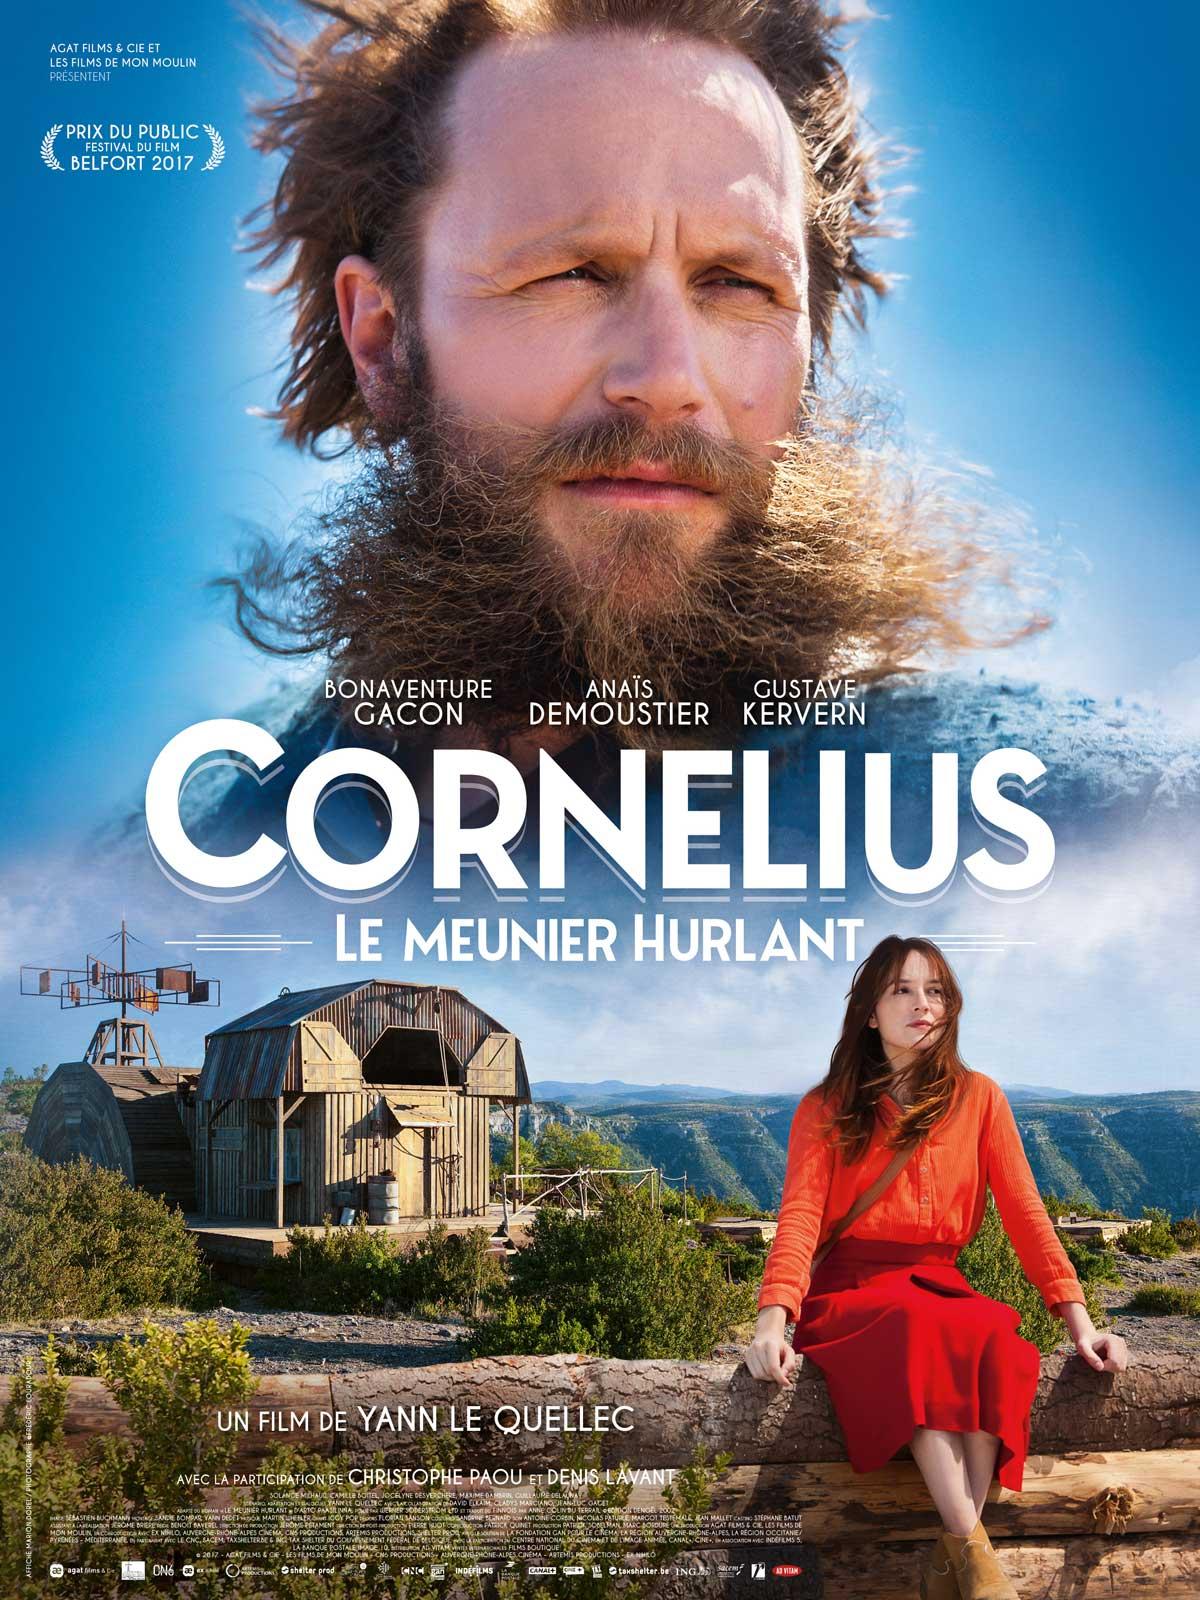 Cornélius, le meunier hurlant HDRip | FRENCH